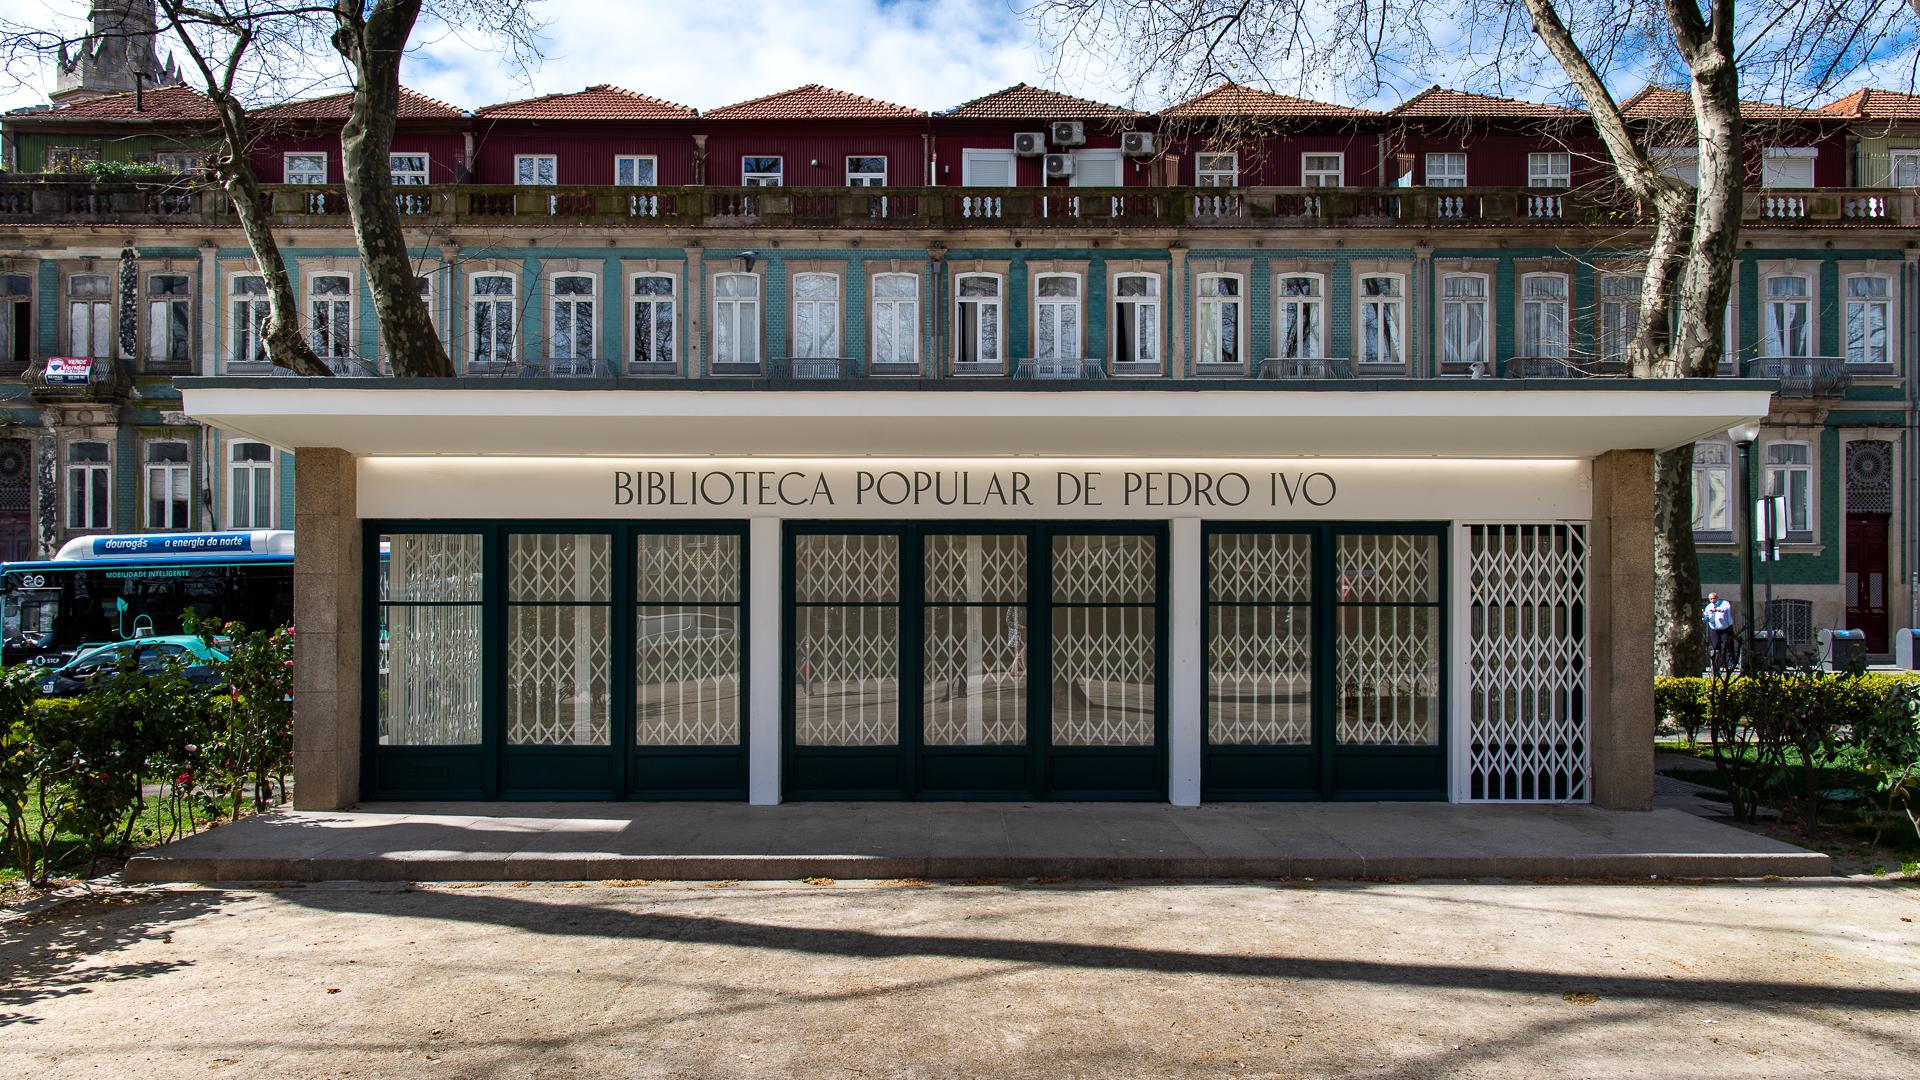 Biblioteca Popular Pedro Ivo